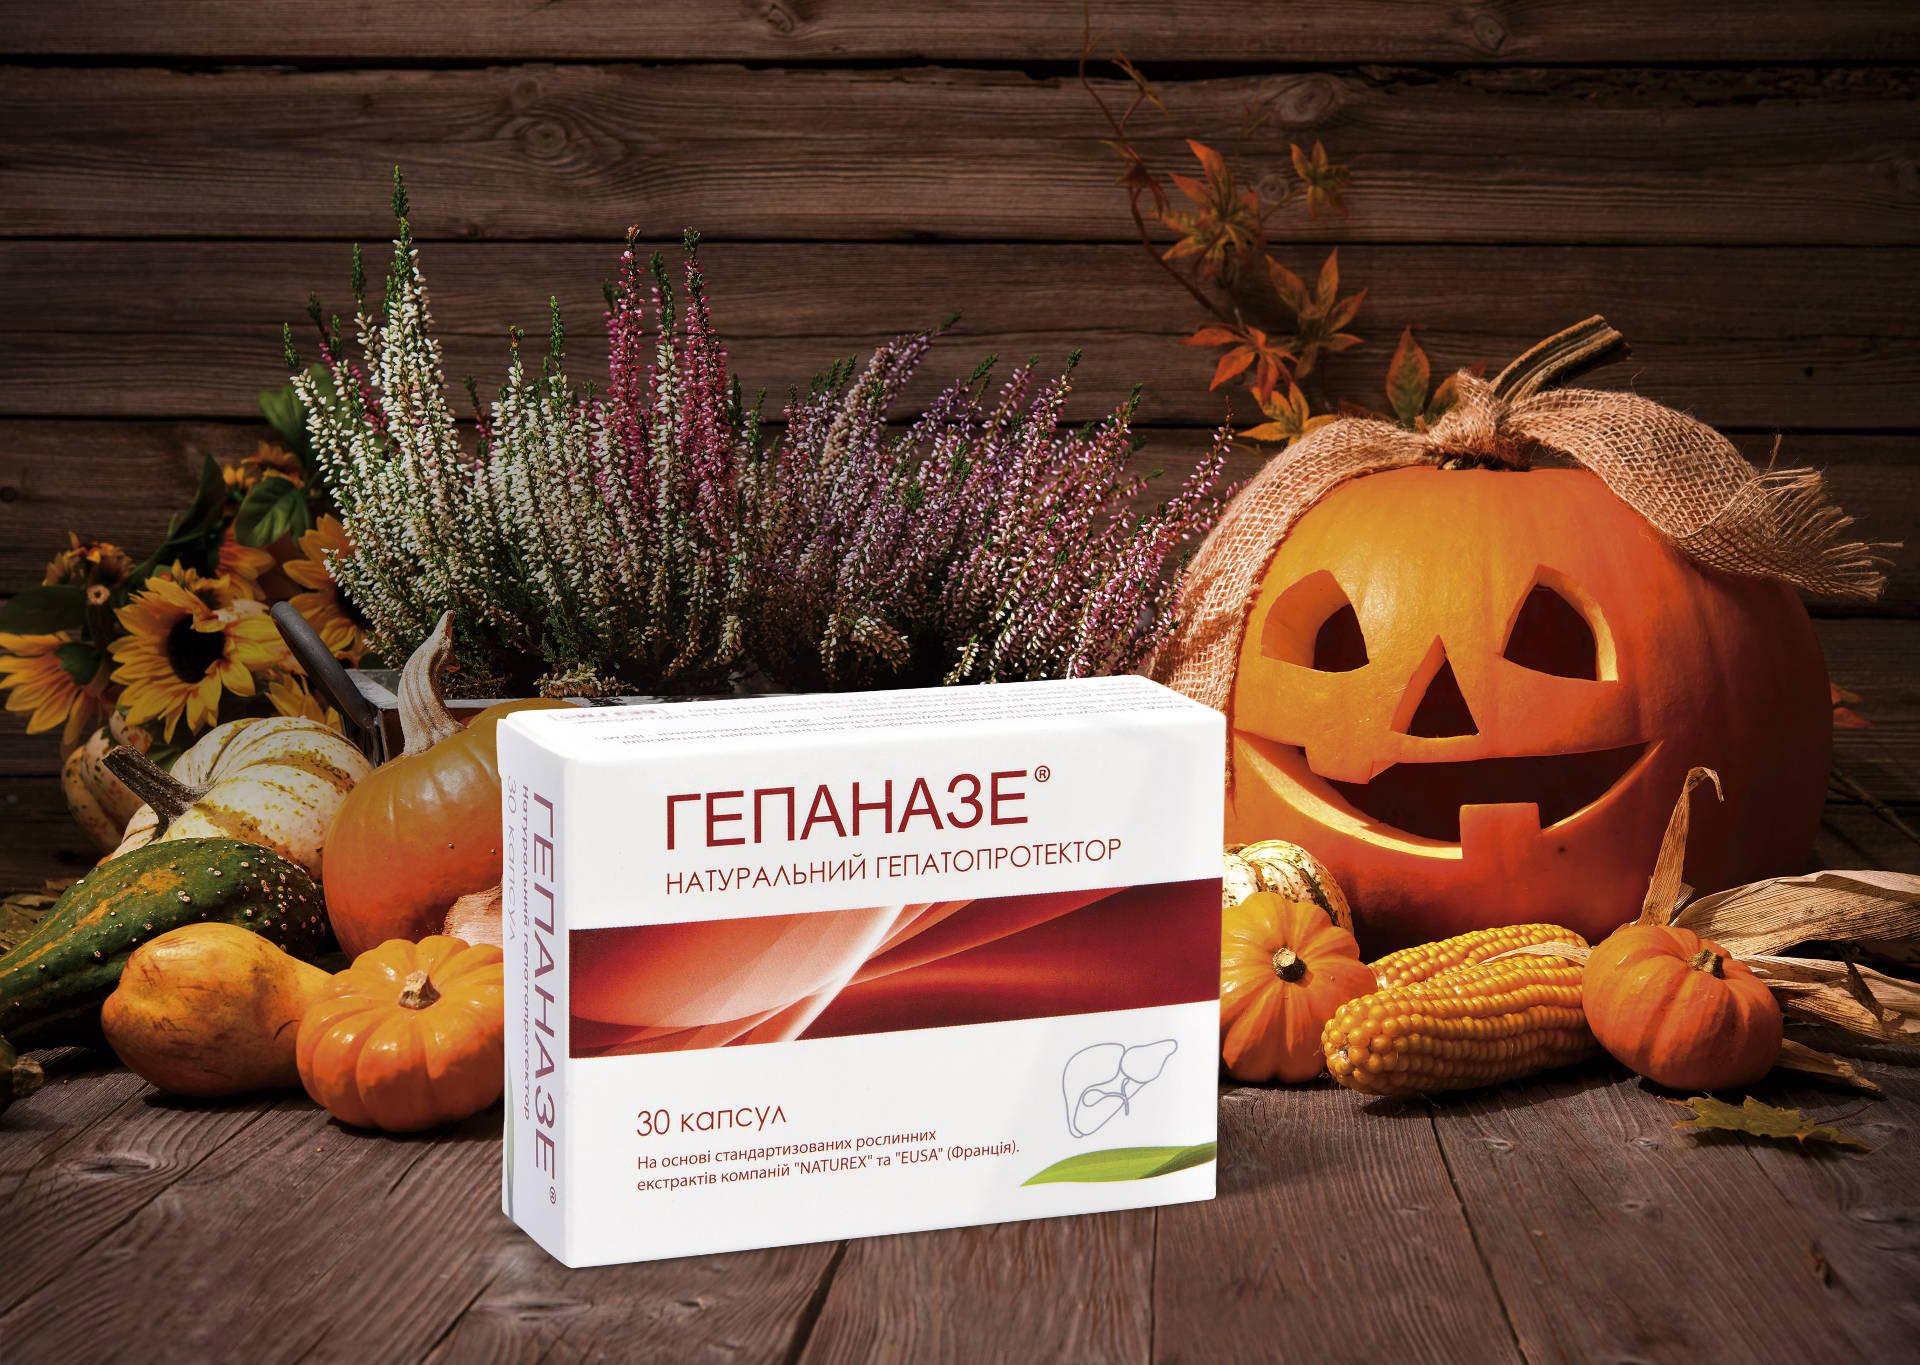 Дизайн упаковки лекарства Гепаназе, Hepanaze medication packaging design